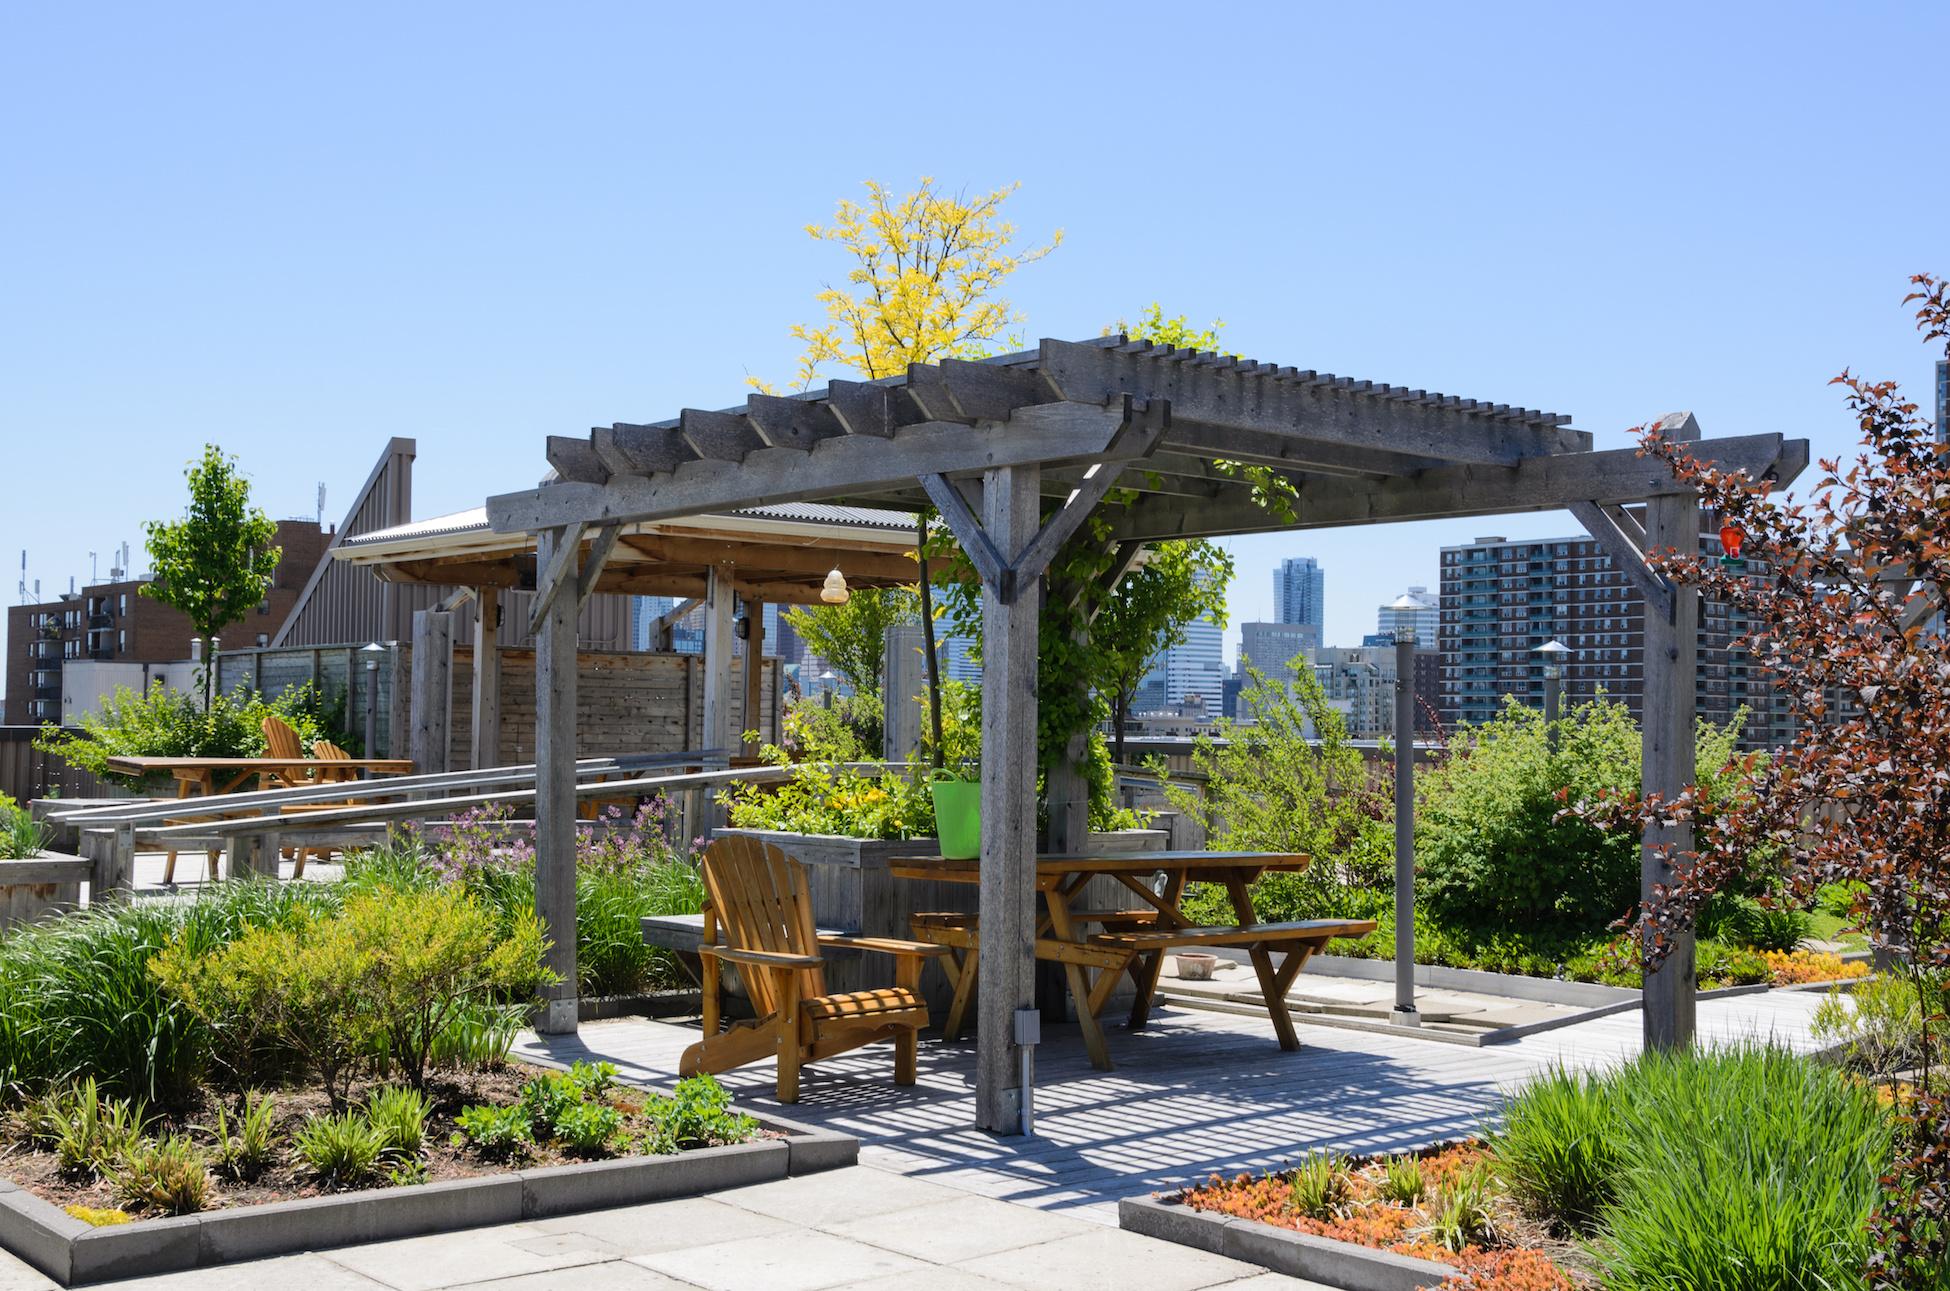 eco-friendly gardening tips